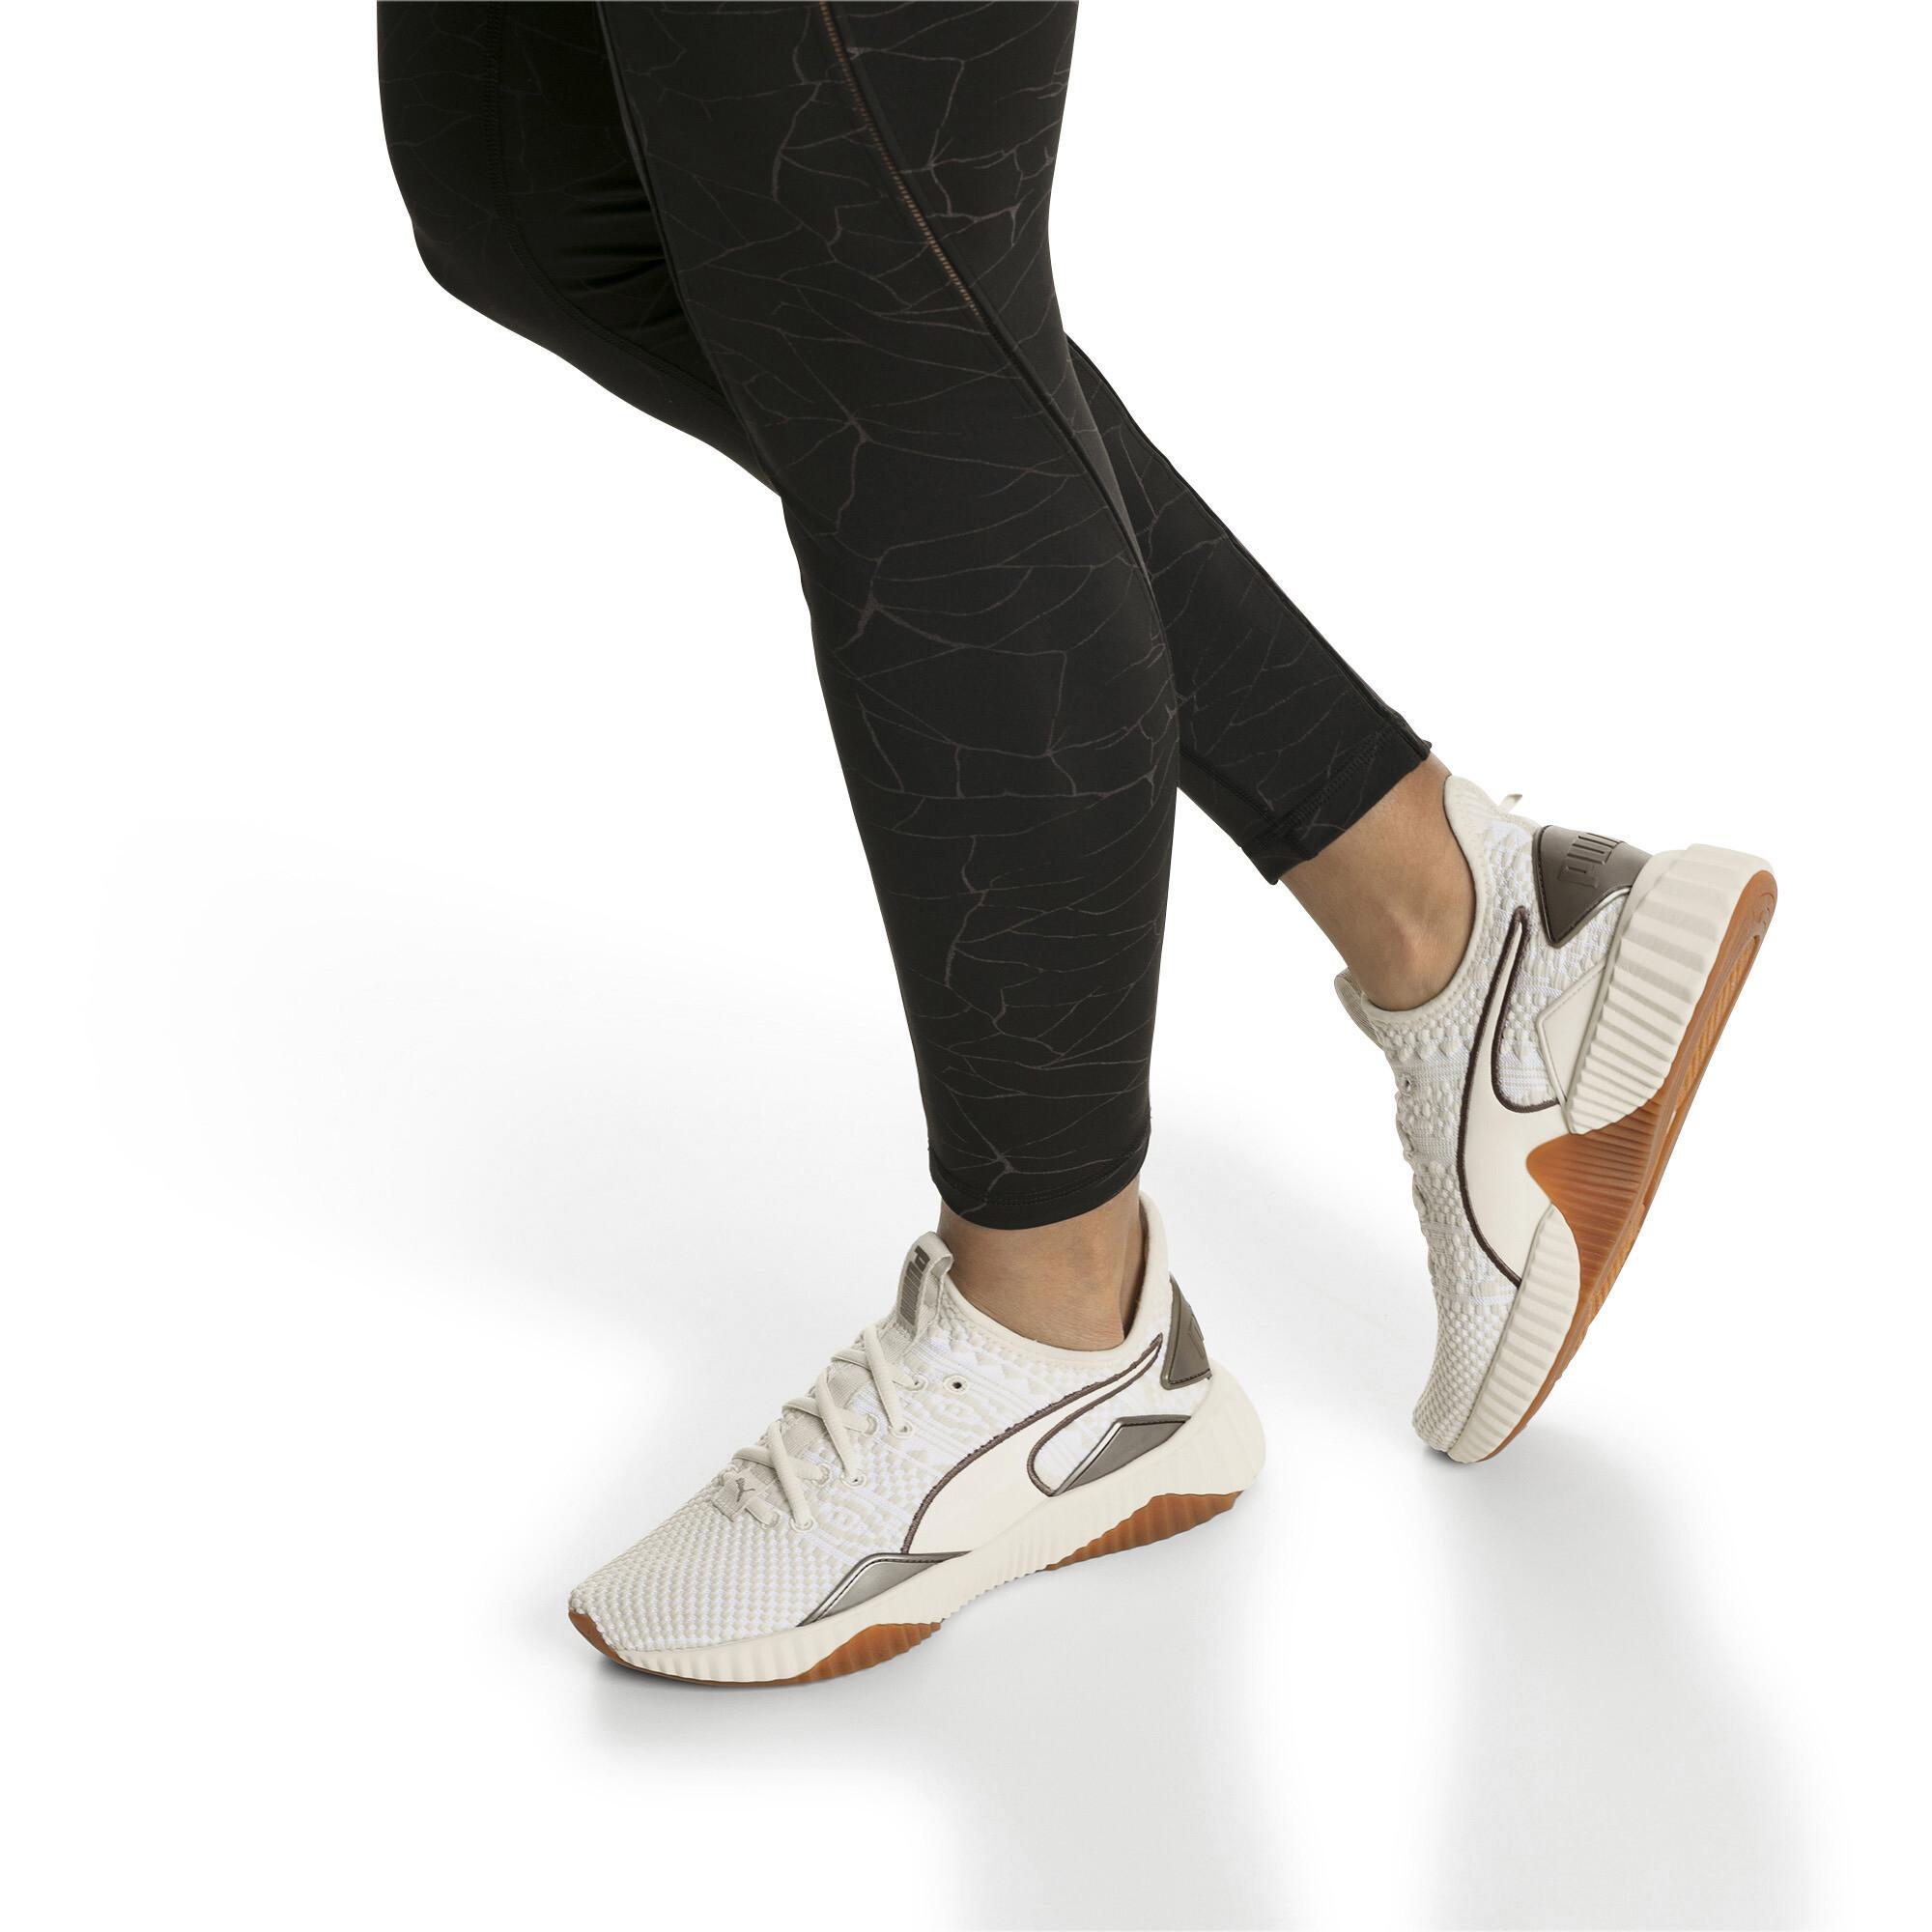 Image Puma Defy Luxe Women's Sneakers #7